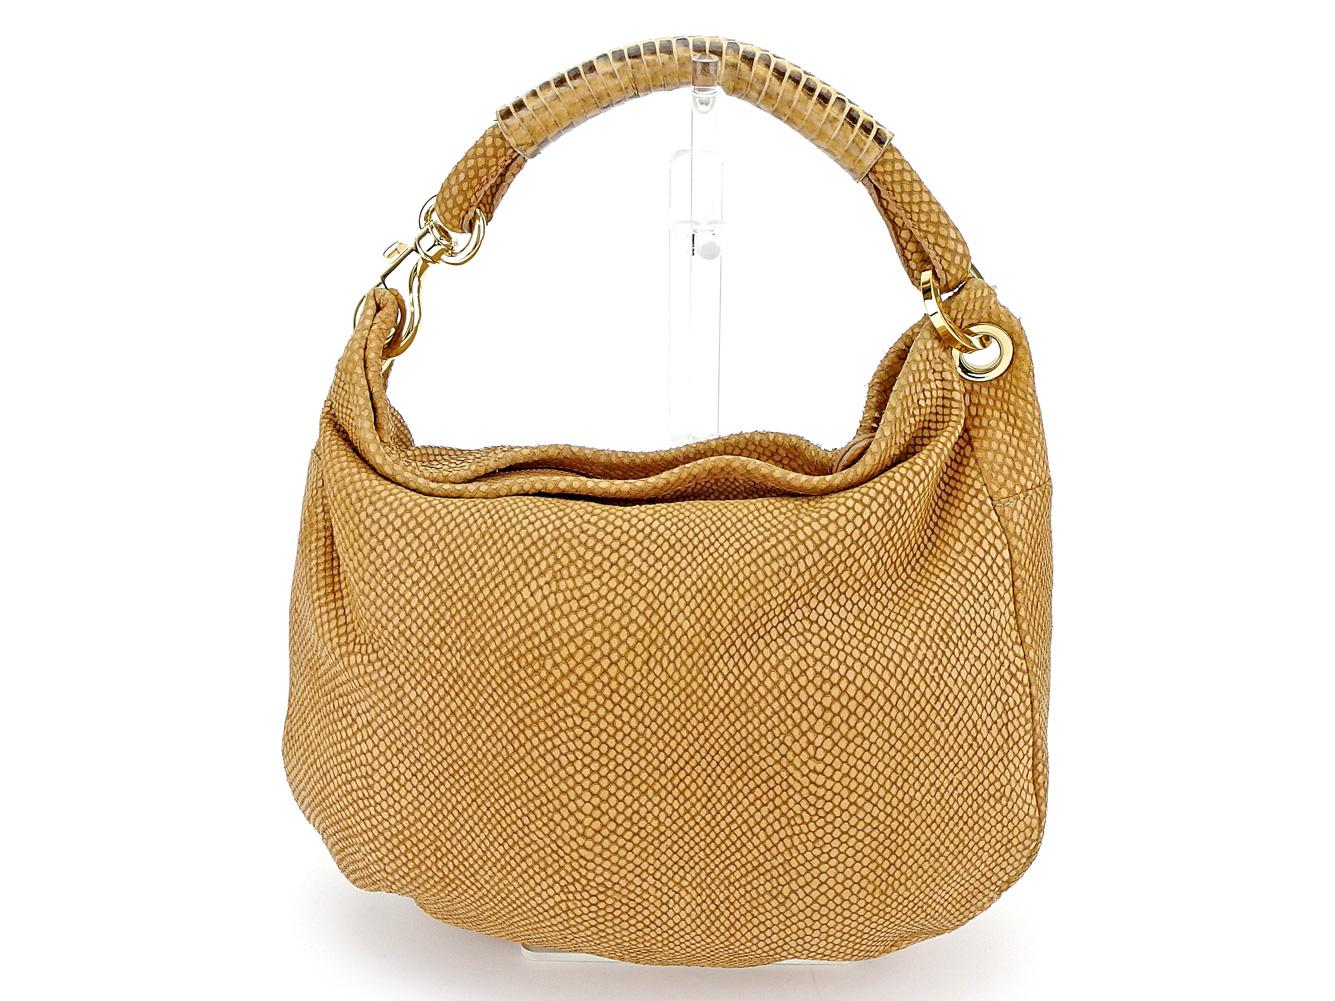 76a67a7f687 ジミーチュウ JIMMY CHOO handbag shoulder bag Lady's Ho baud python steering wheel  beige X gold system type push leather X python quality goods ...